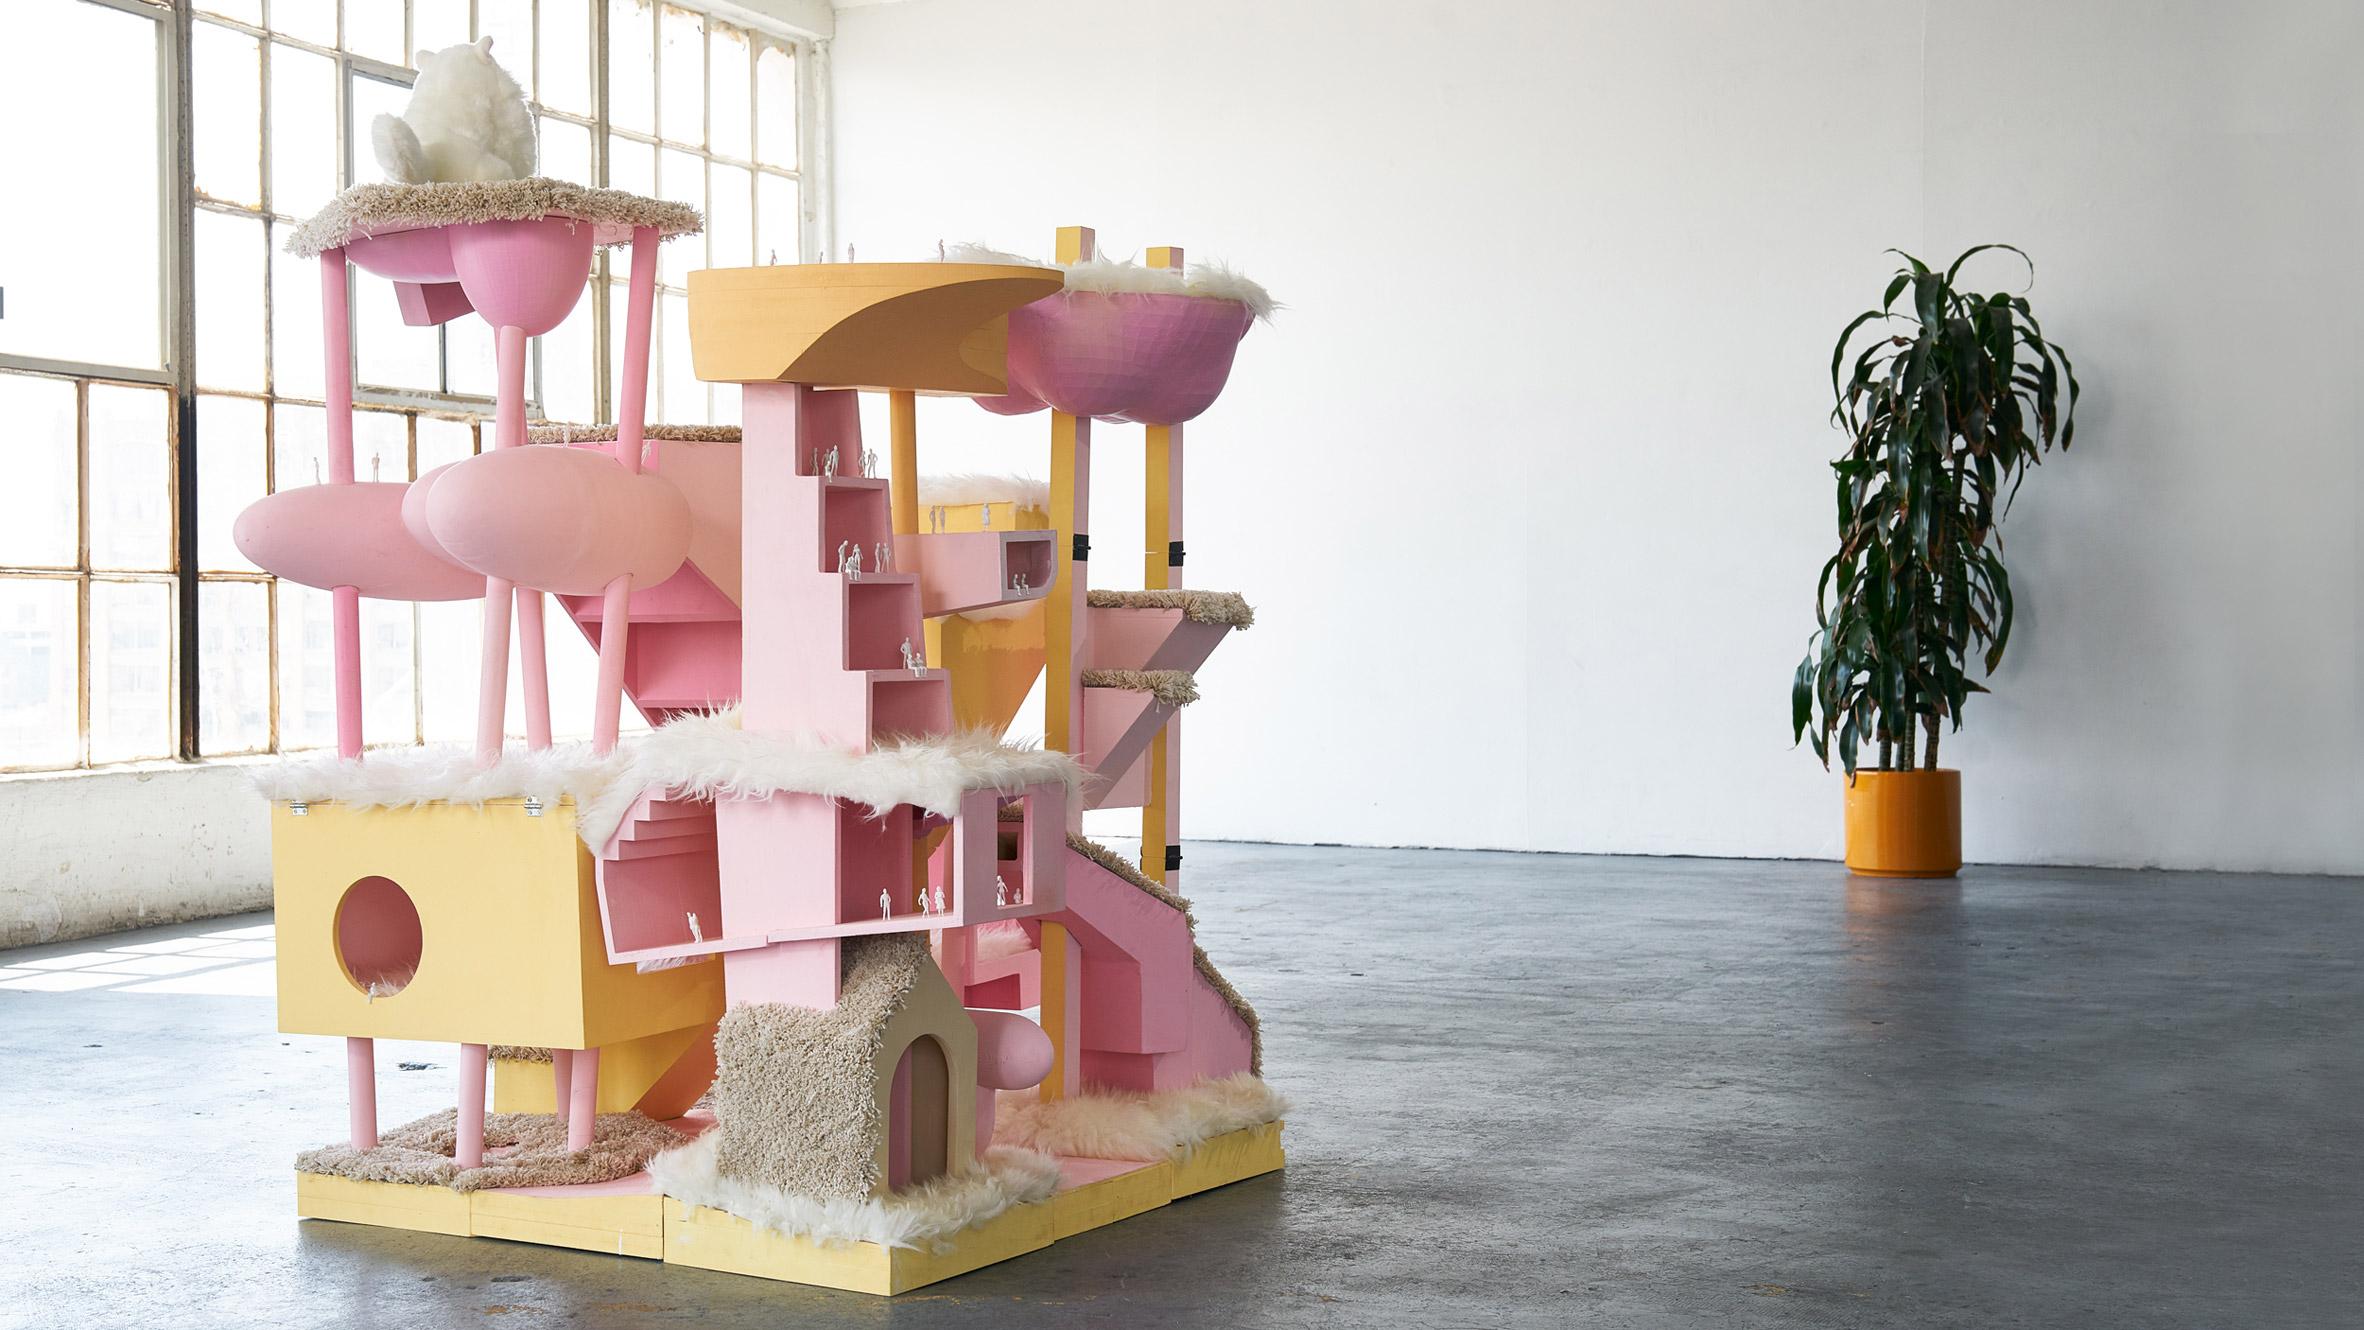 Bureau spectacular creates model high rise that doubles as a cat tower